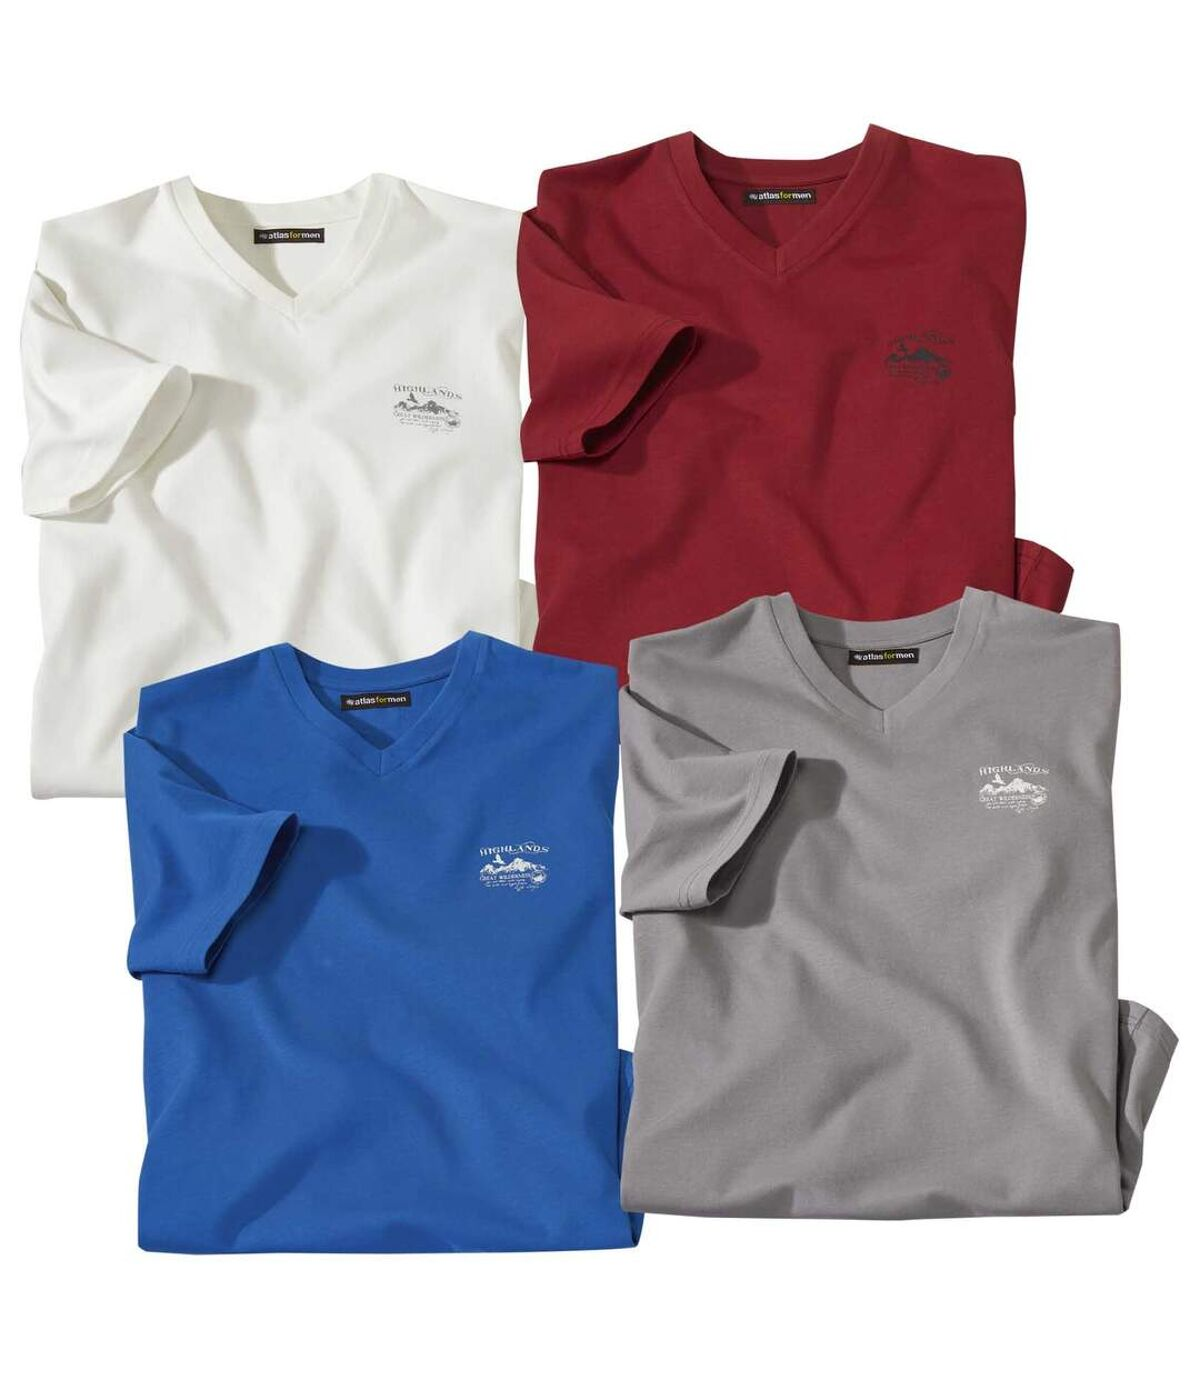 Sada 4 triček Westlands s výstřihem do V Atlas For Men